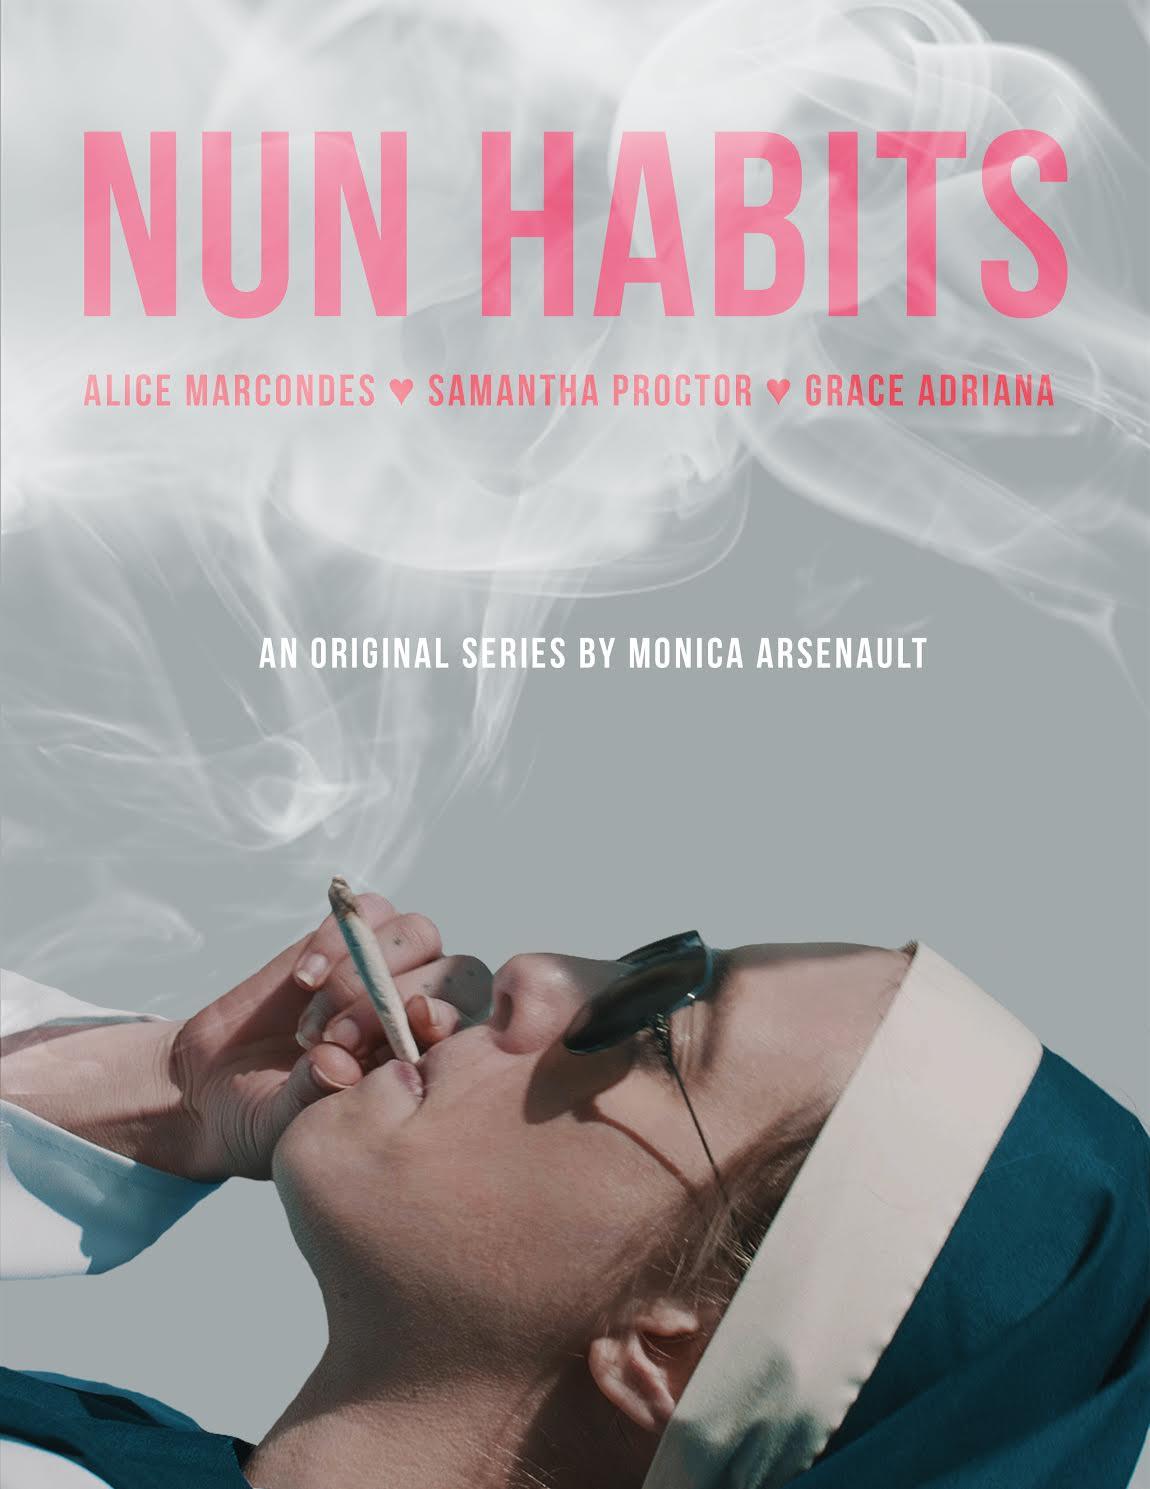 Nun Habits